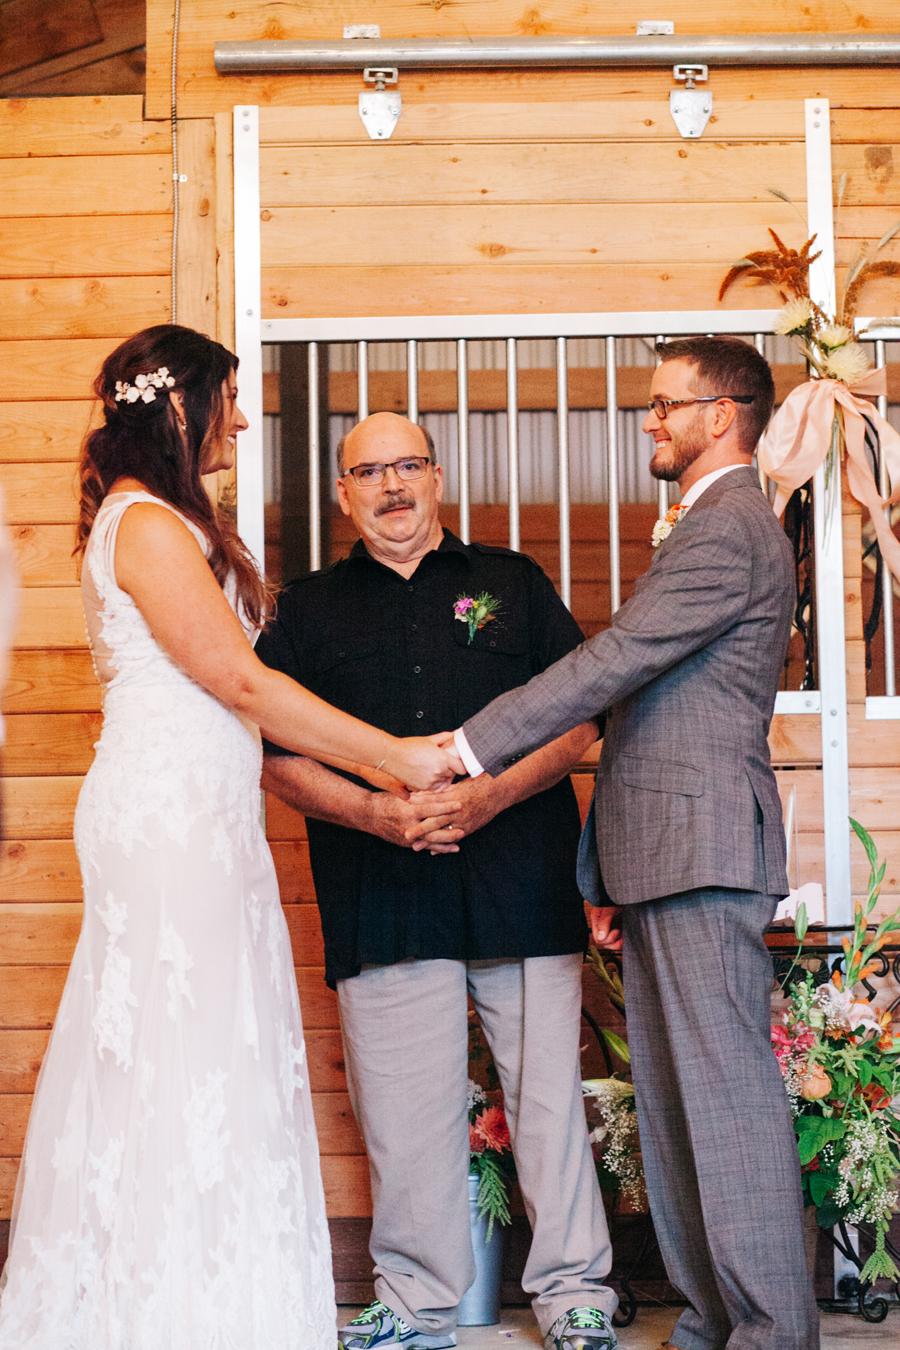 076-bellingham-wedding-photographer-katheryn-moran-photography-farm-kitchen.jpg